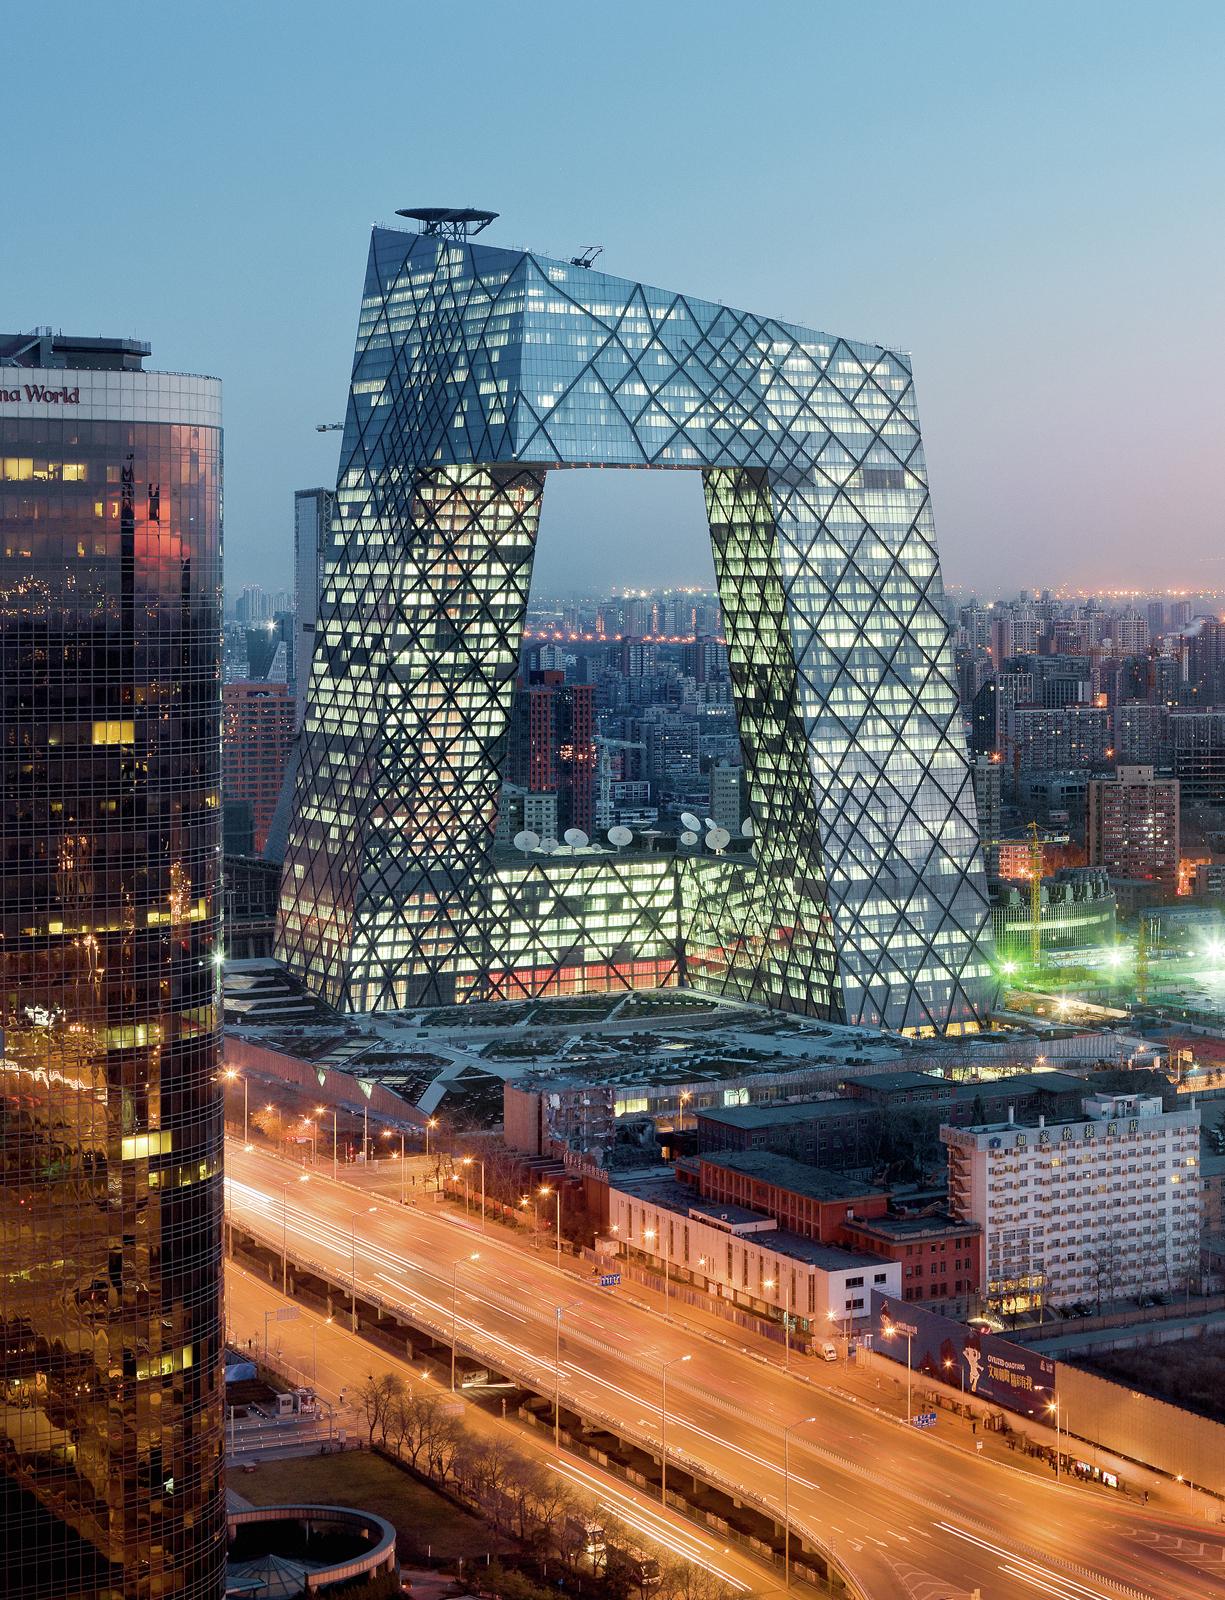 CCTV-Beijing-Iwan-Baan.jpg